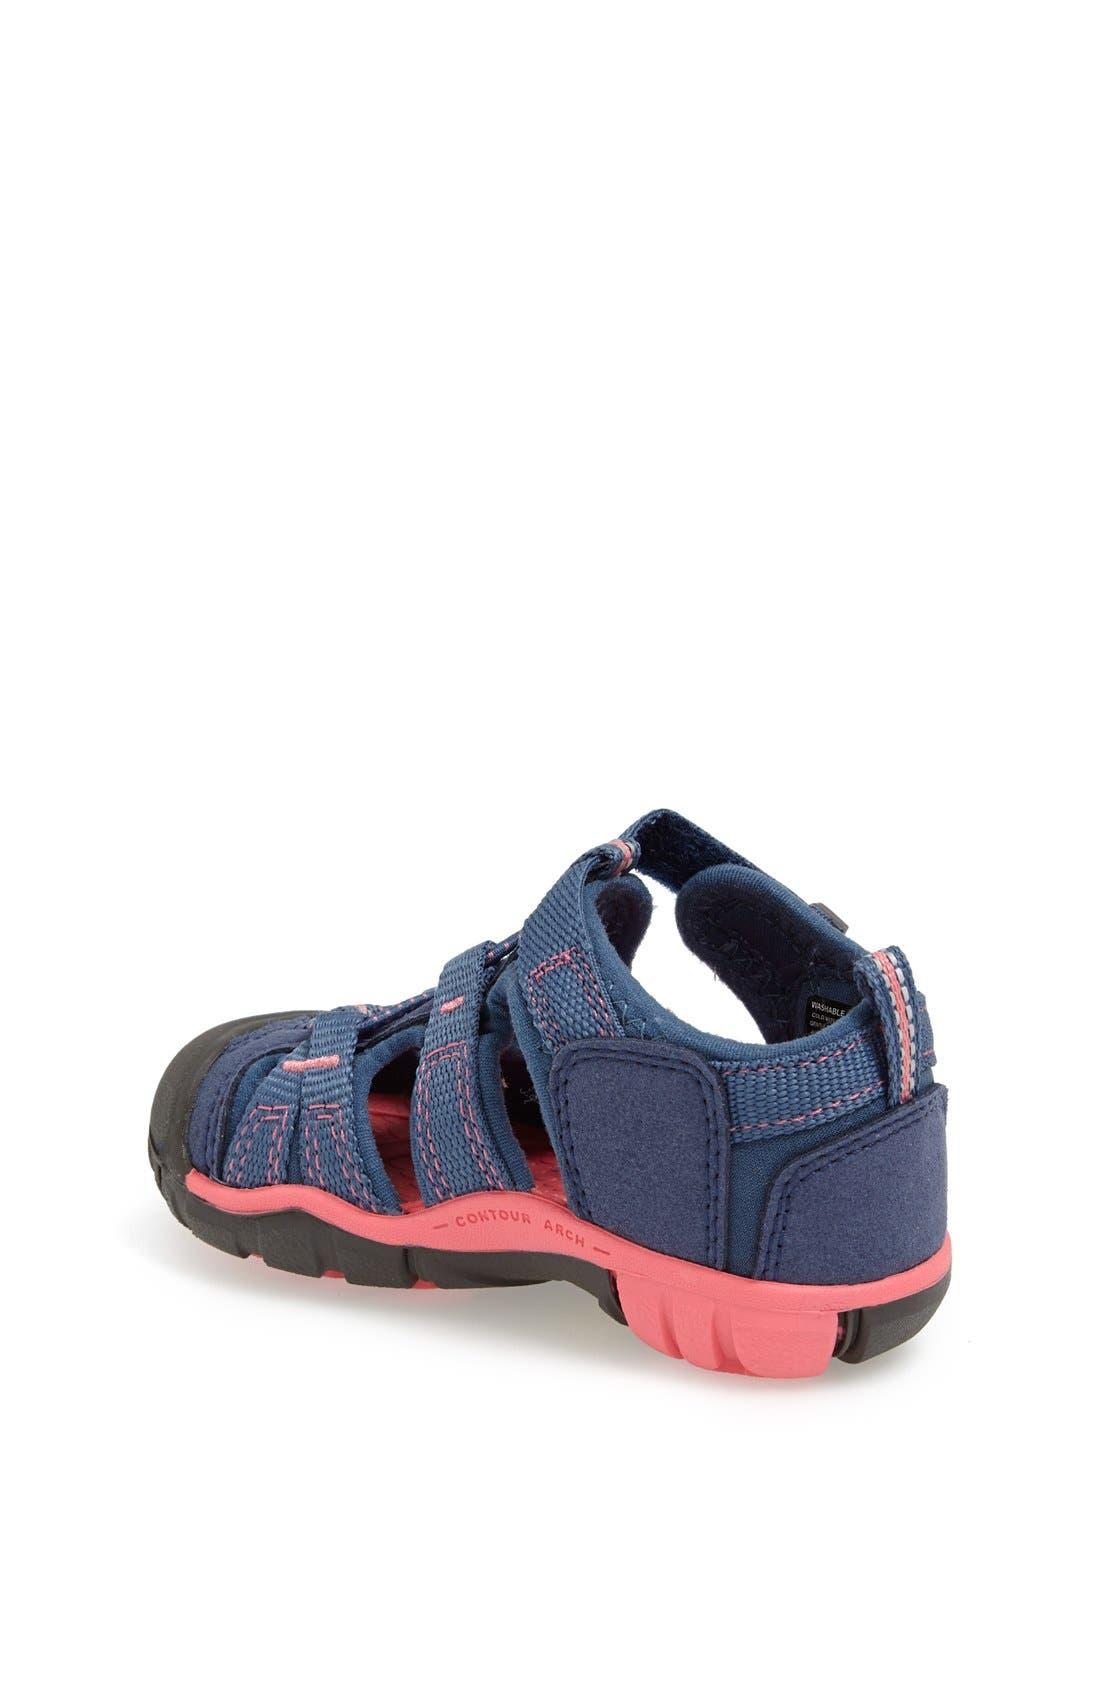 'Seacamp II' Waterproof Sandal,                             Alternate thumbnail 2, color,                             Blue Rose